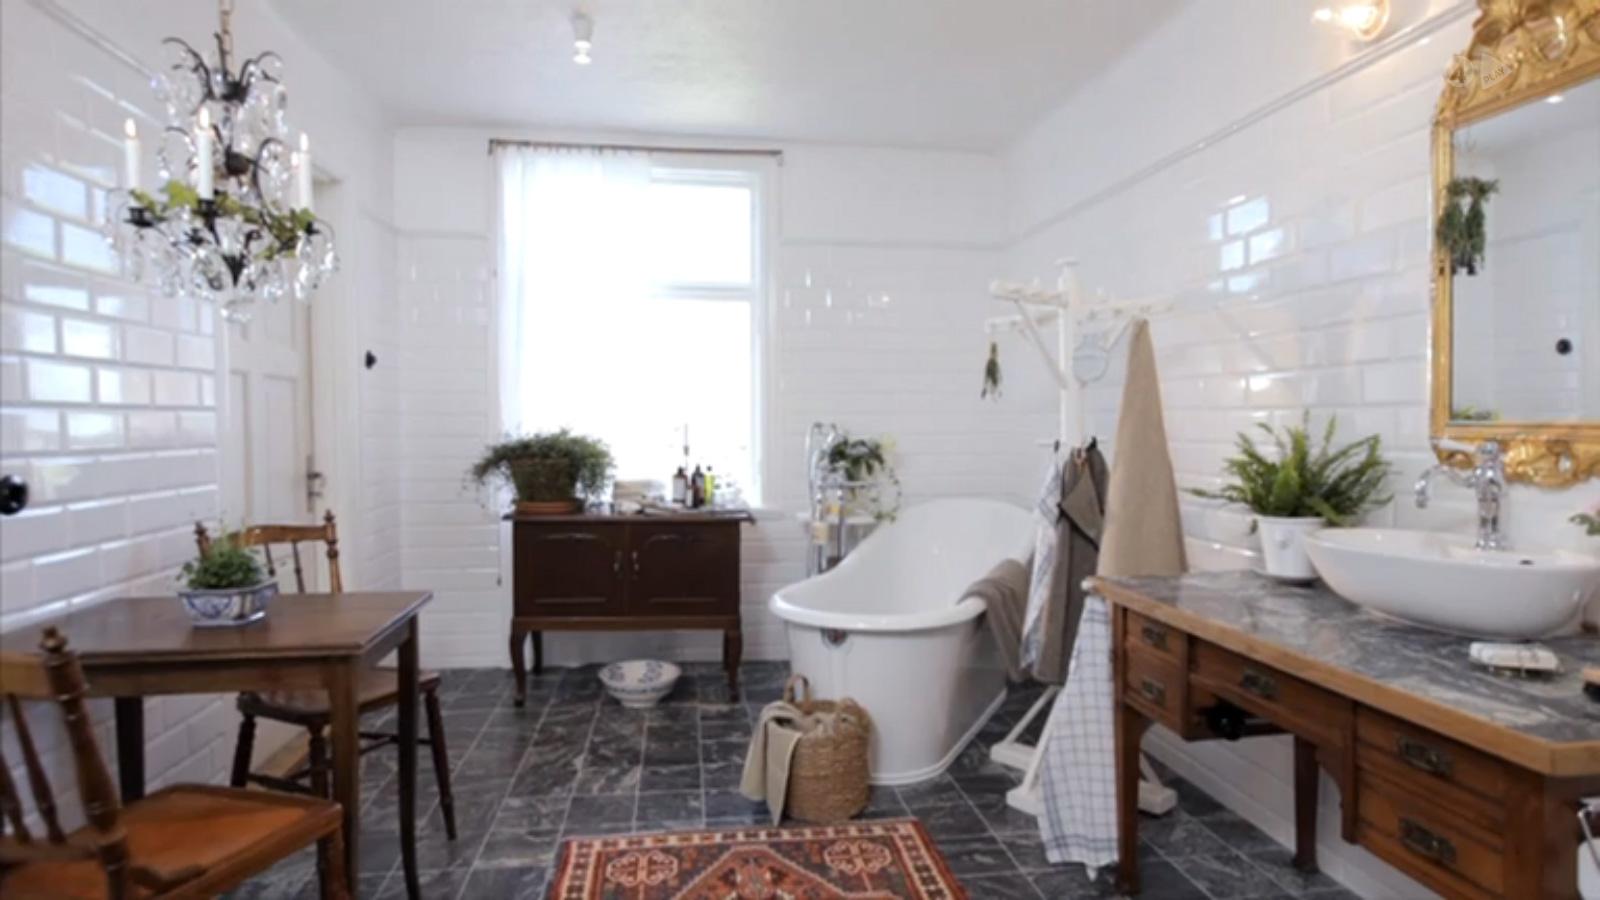 sommar-med-ernst_badrum-efter-renovering_vitt10x20-fasad-kakel_kolmårdsmarmor_badrum-inspiration_badrumsdrömmar